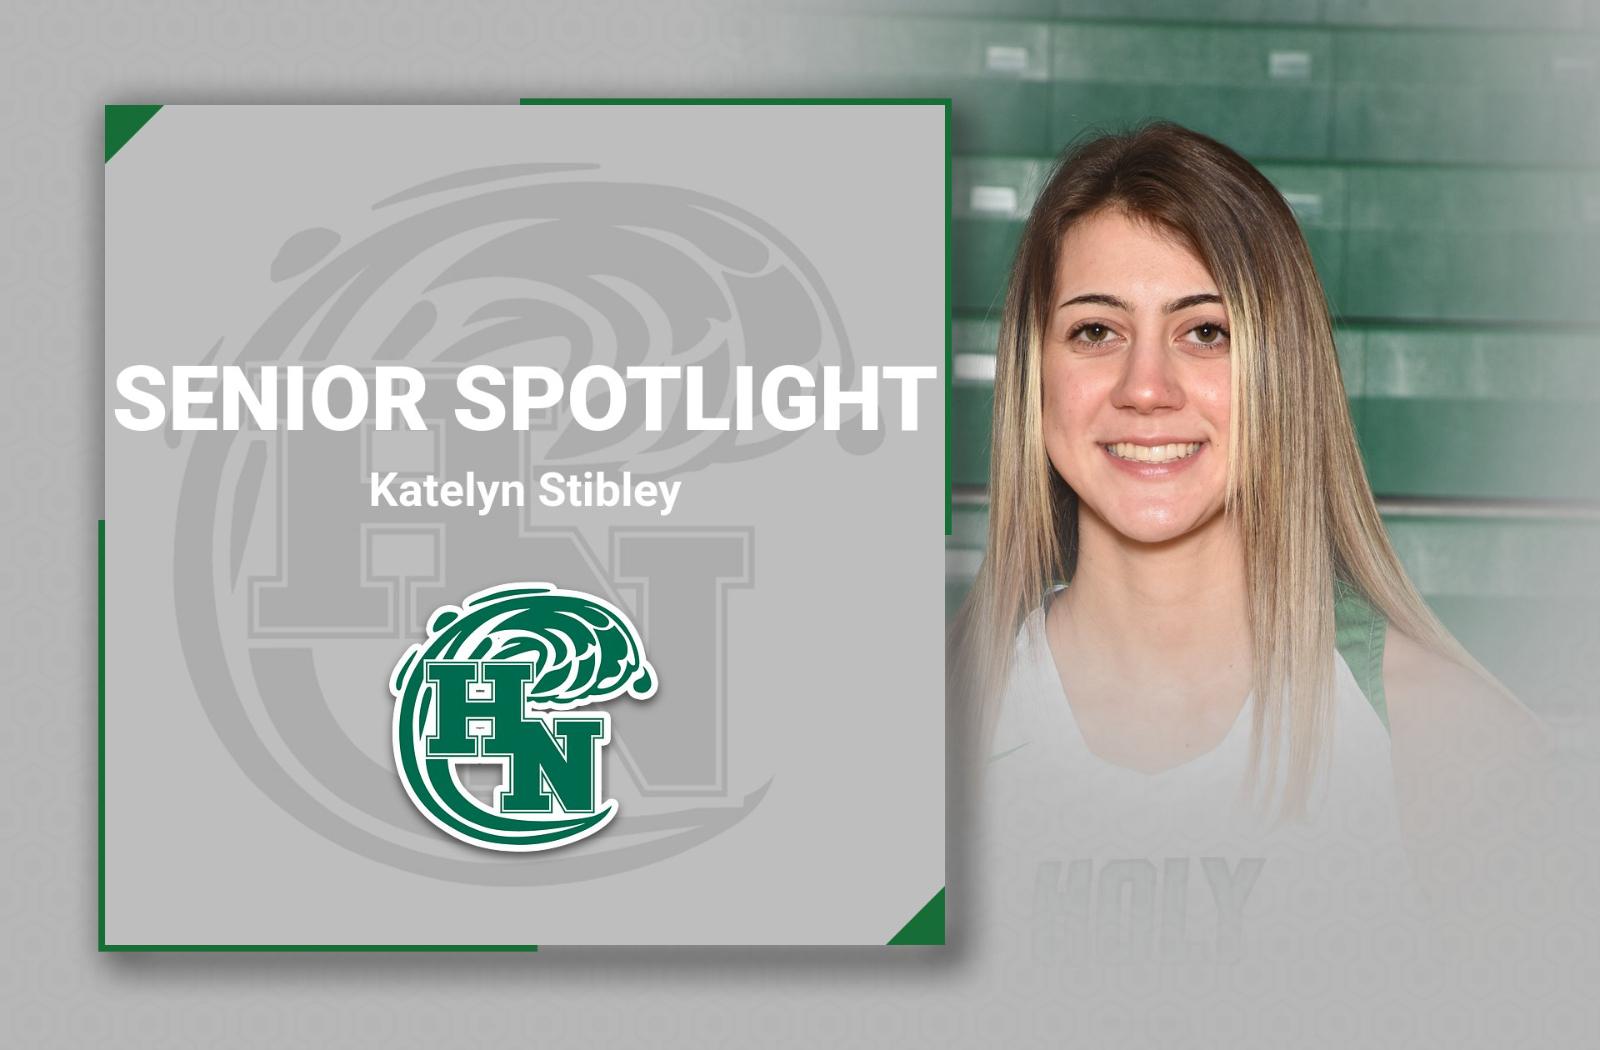 Senior Spotlight: Katelyn Stibley